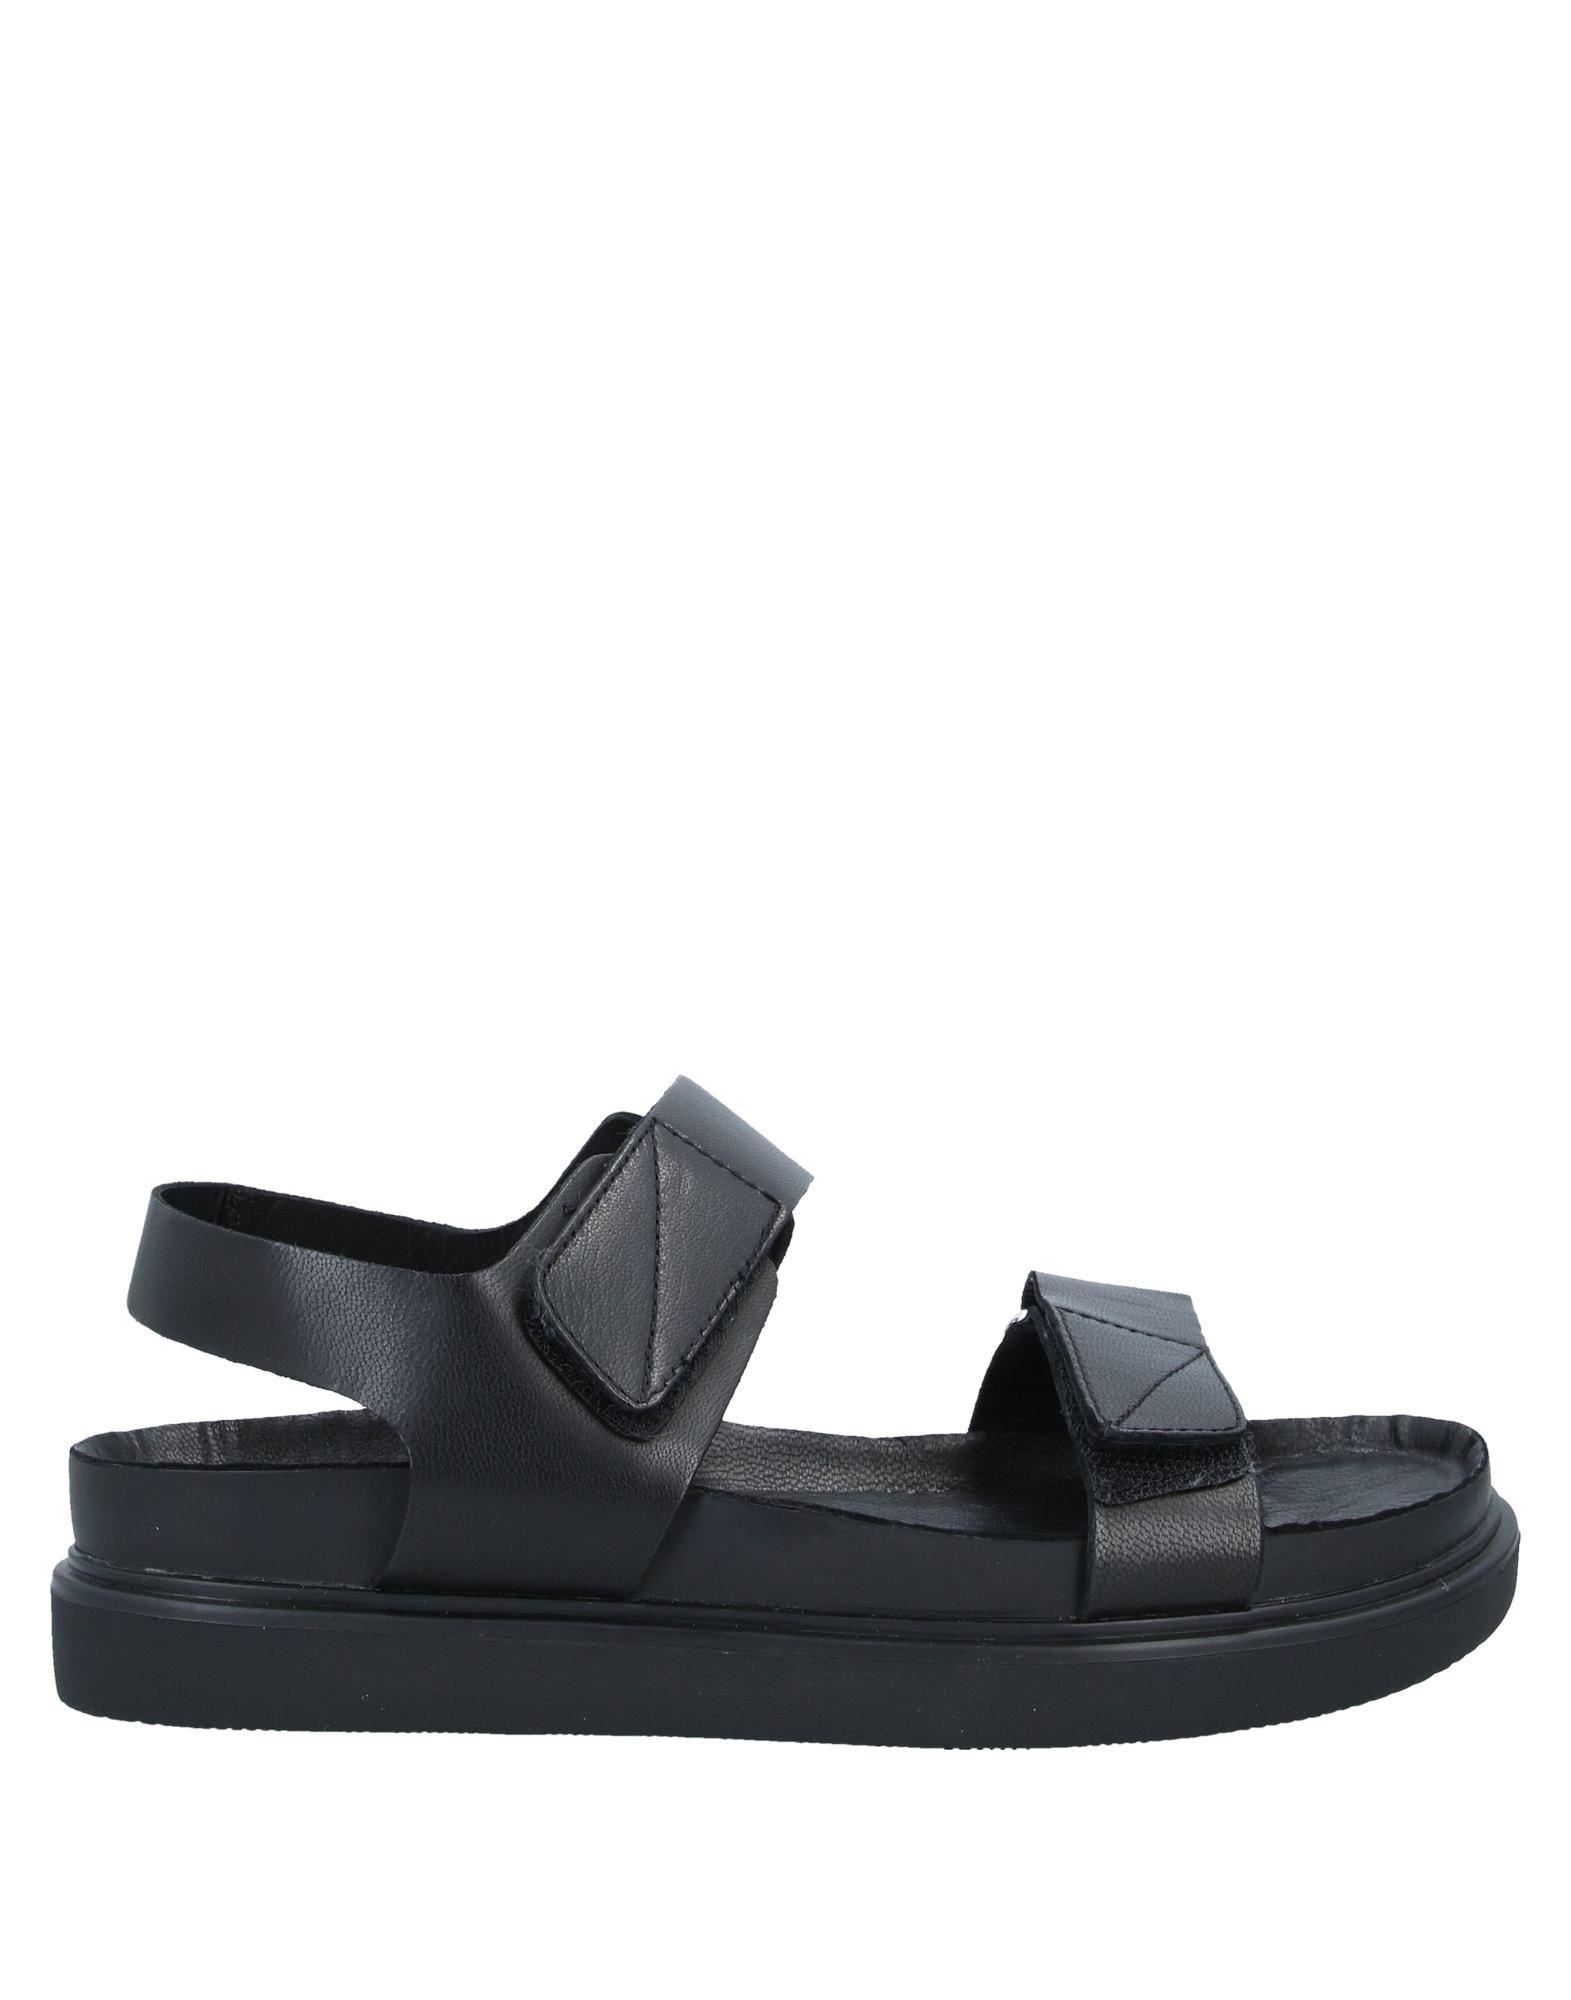 VAGABOND SHOEMAKERS Сандалии сандалии vagabond сандалии